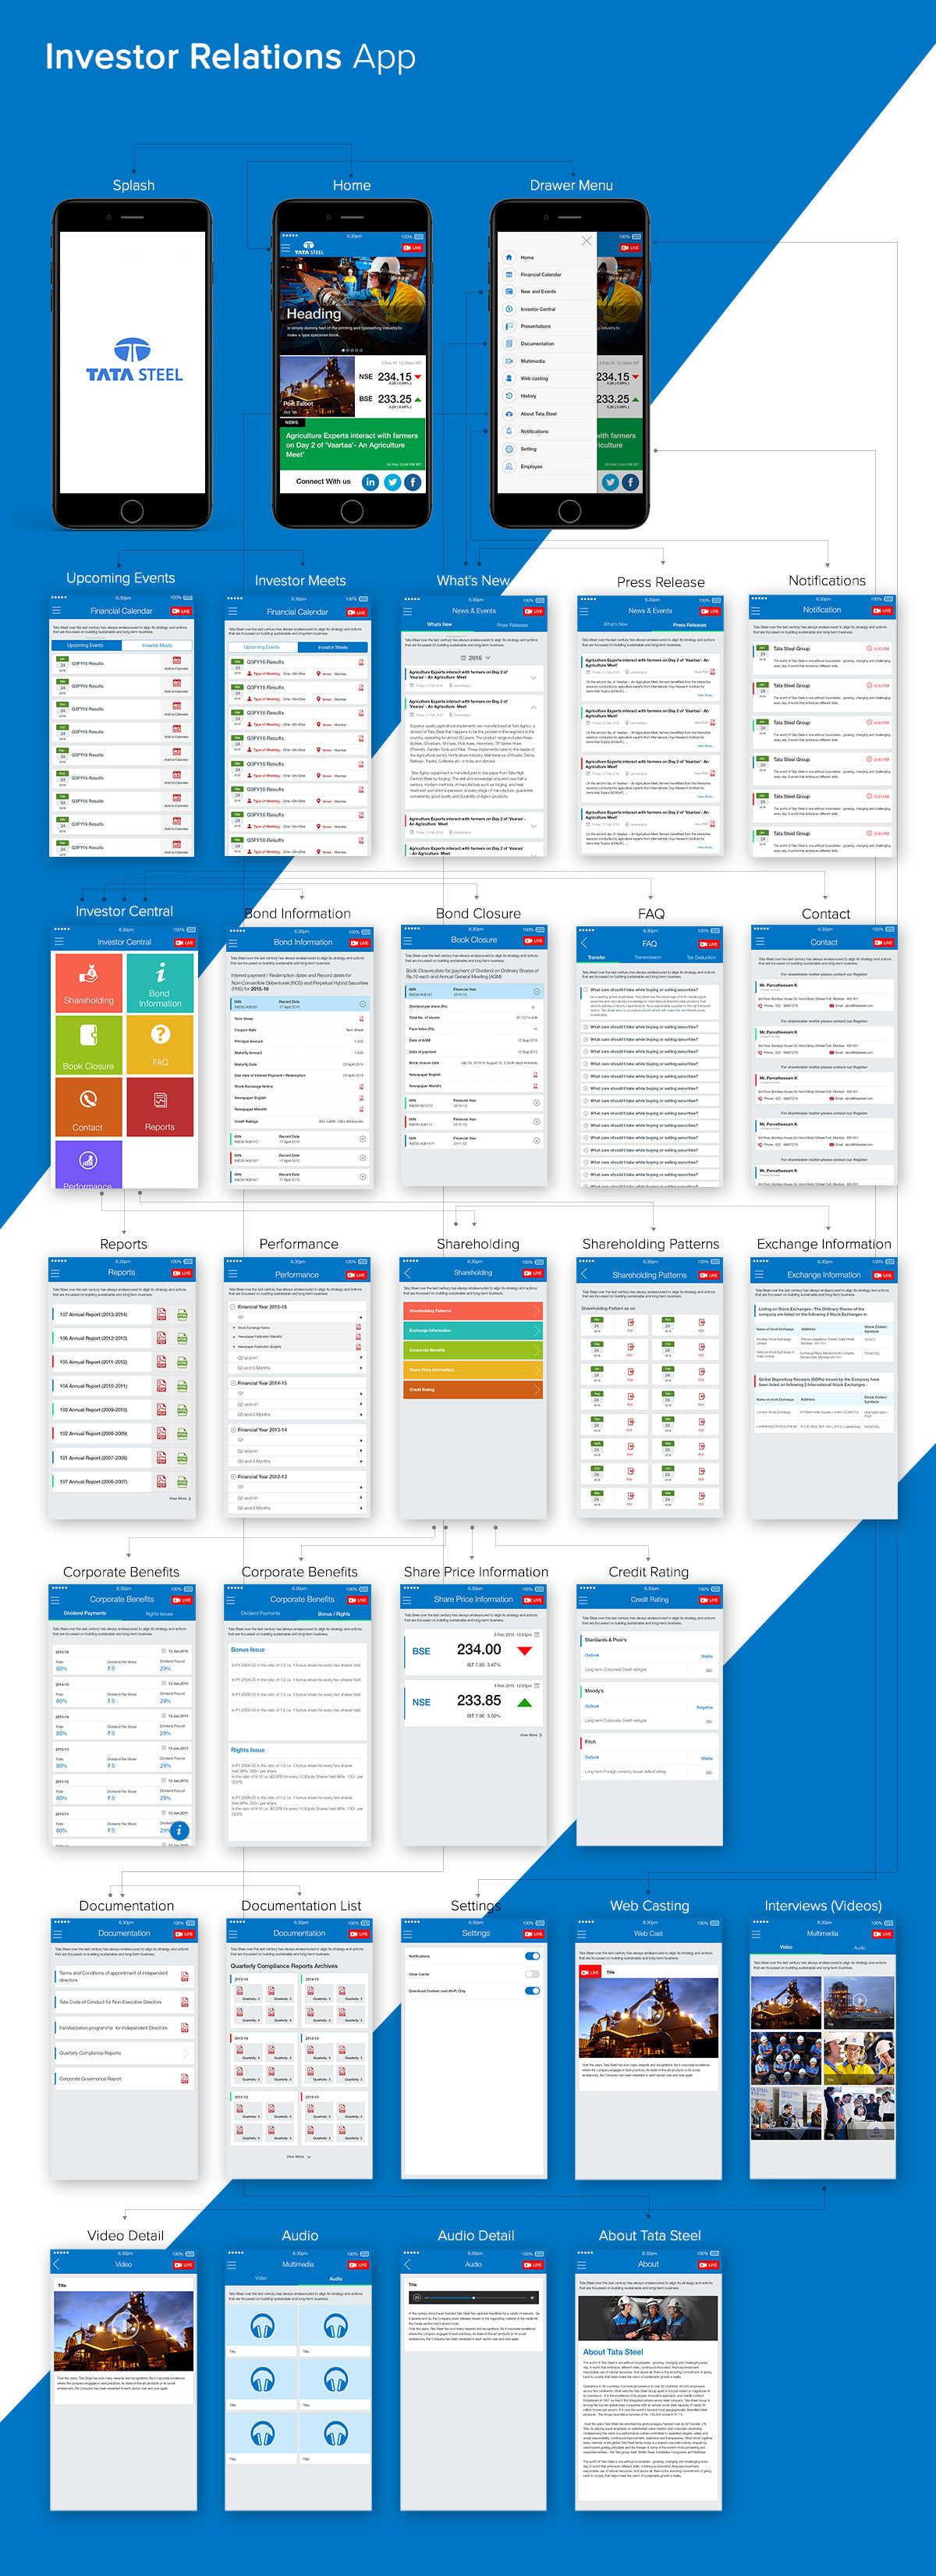 UXSense Investors Relations App